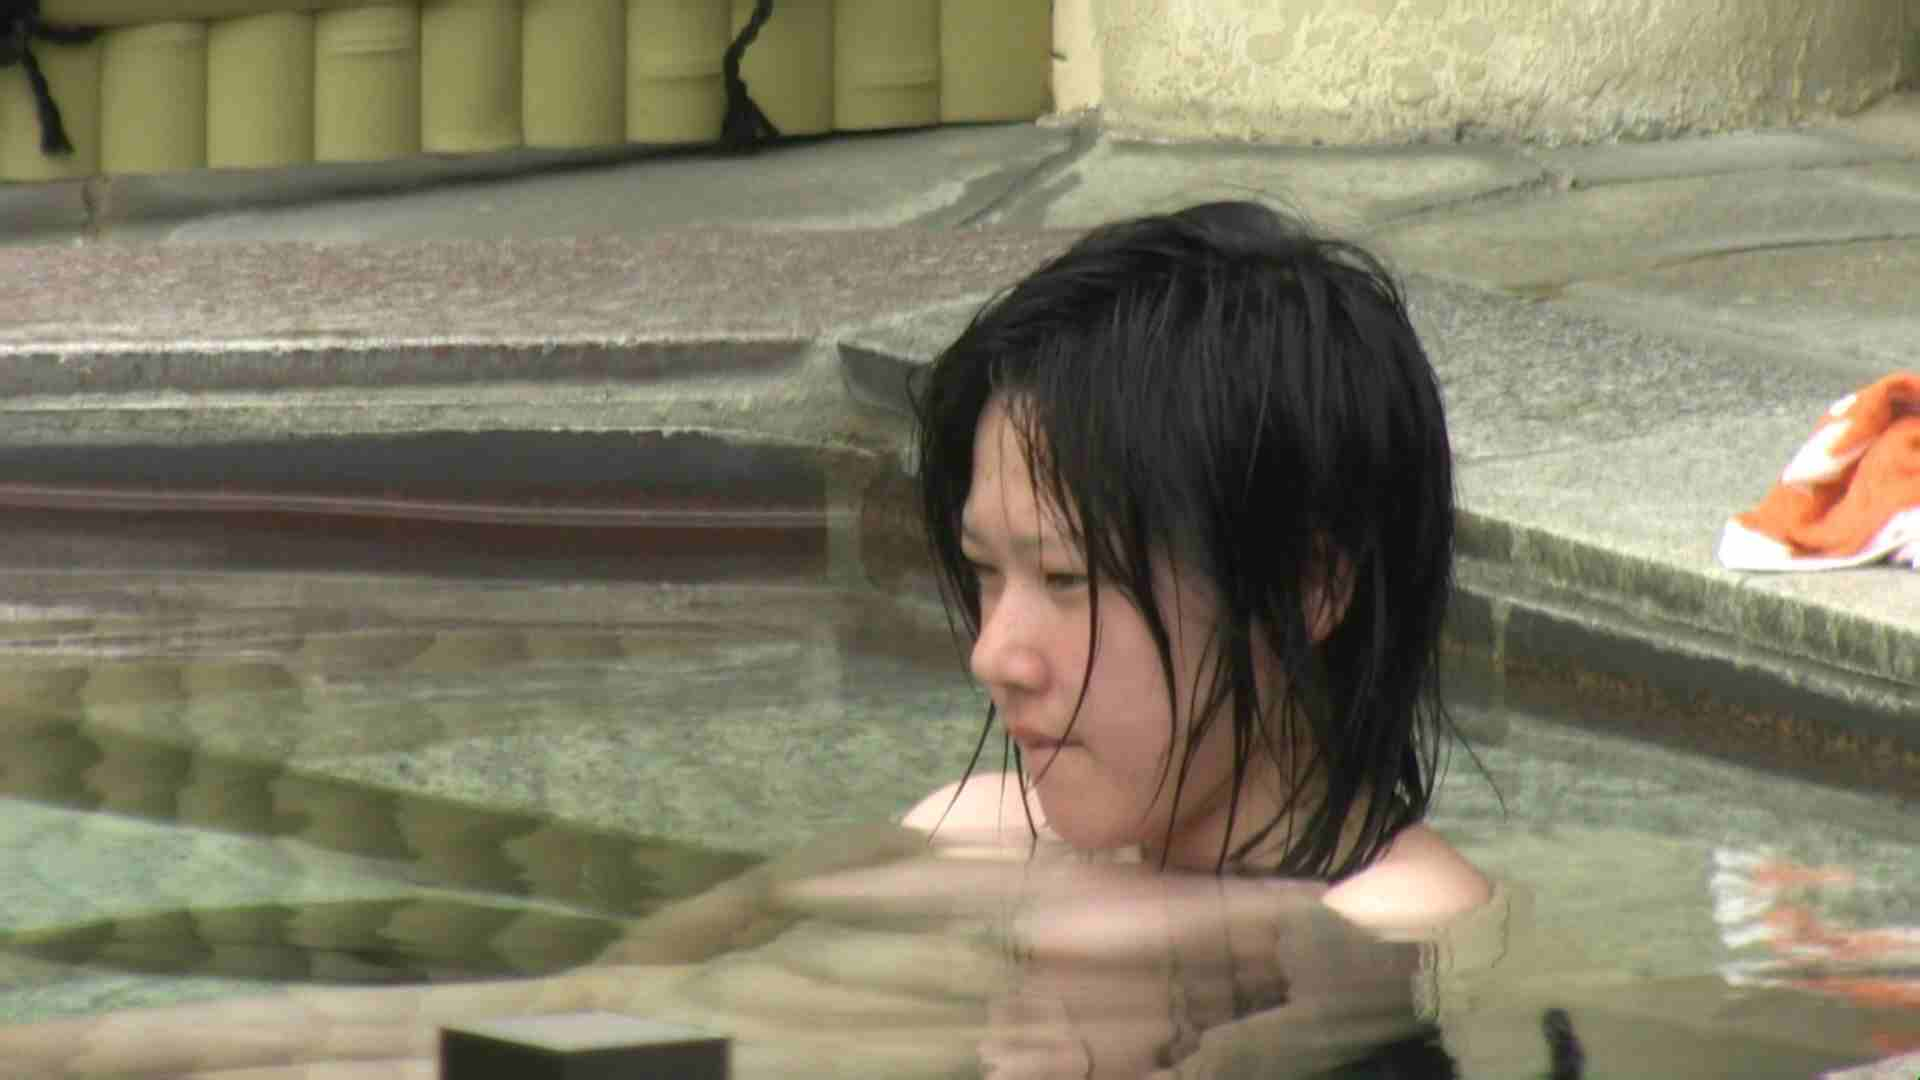 Aquaな露天風呂Vol.36 盗撮シリーズ   露天風呂編  99PIX 51